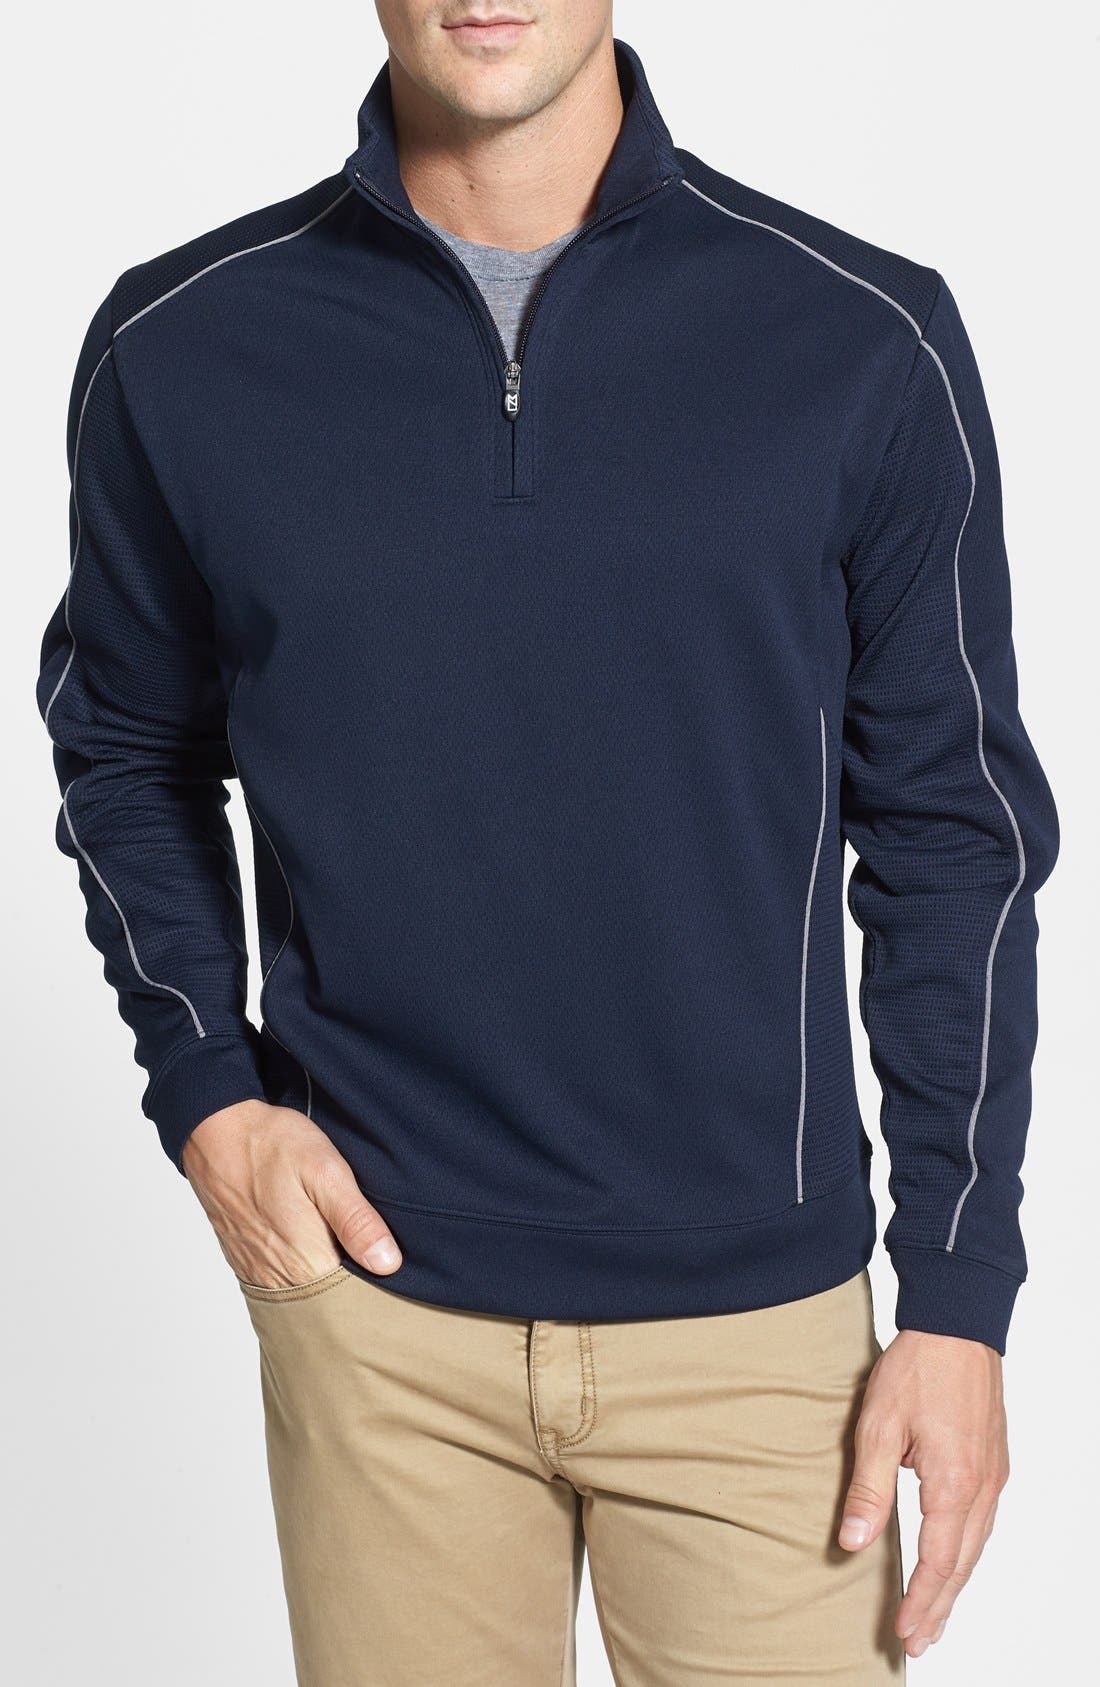 Alternate Image 1 Selected - Cutter & Buck DryTec Half Zip Pullover